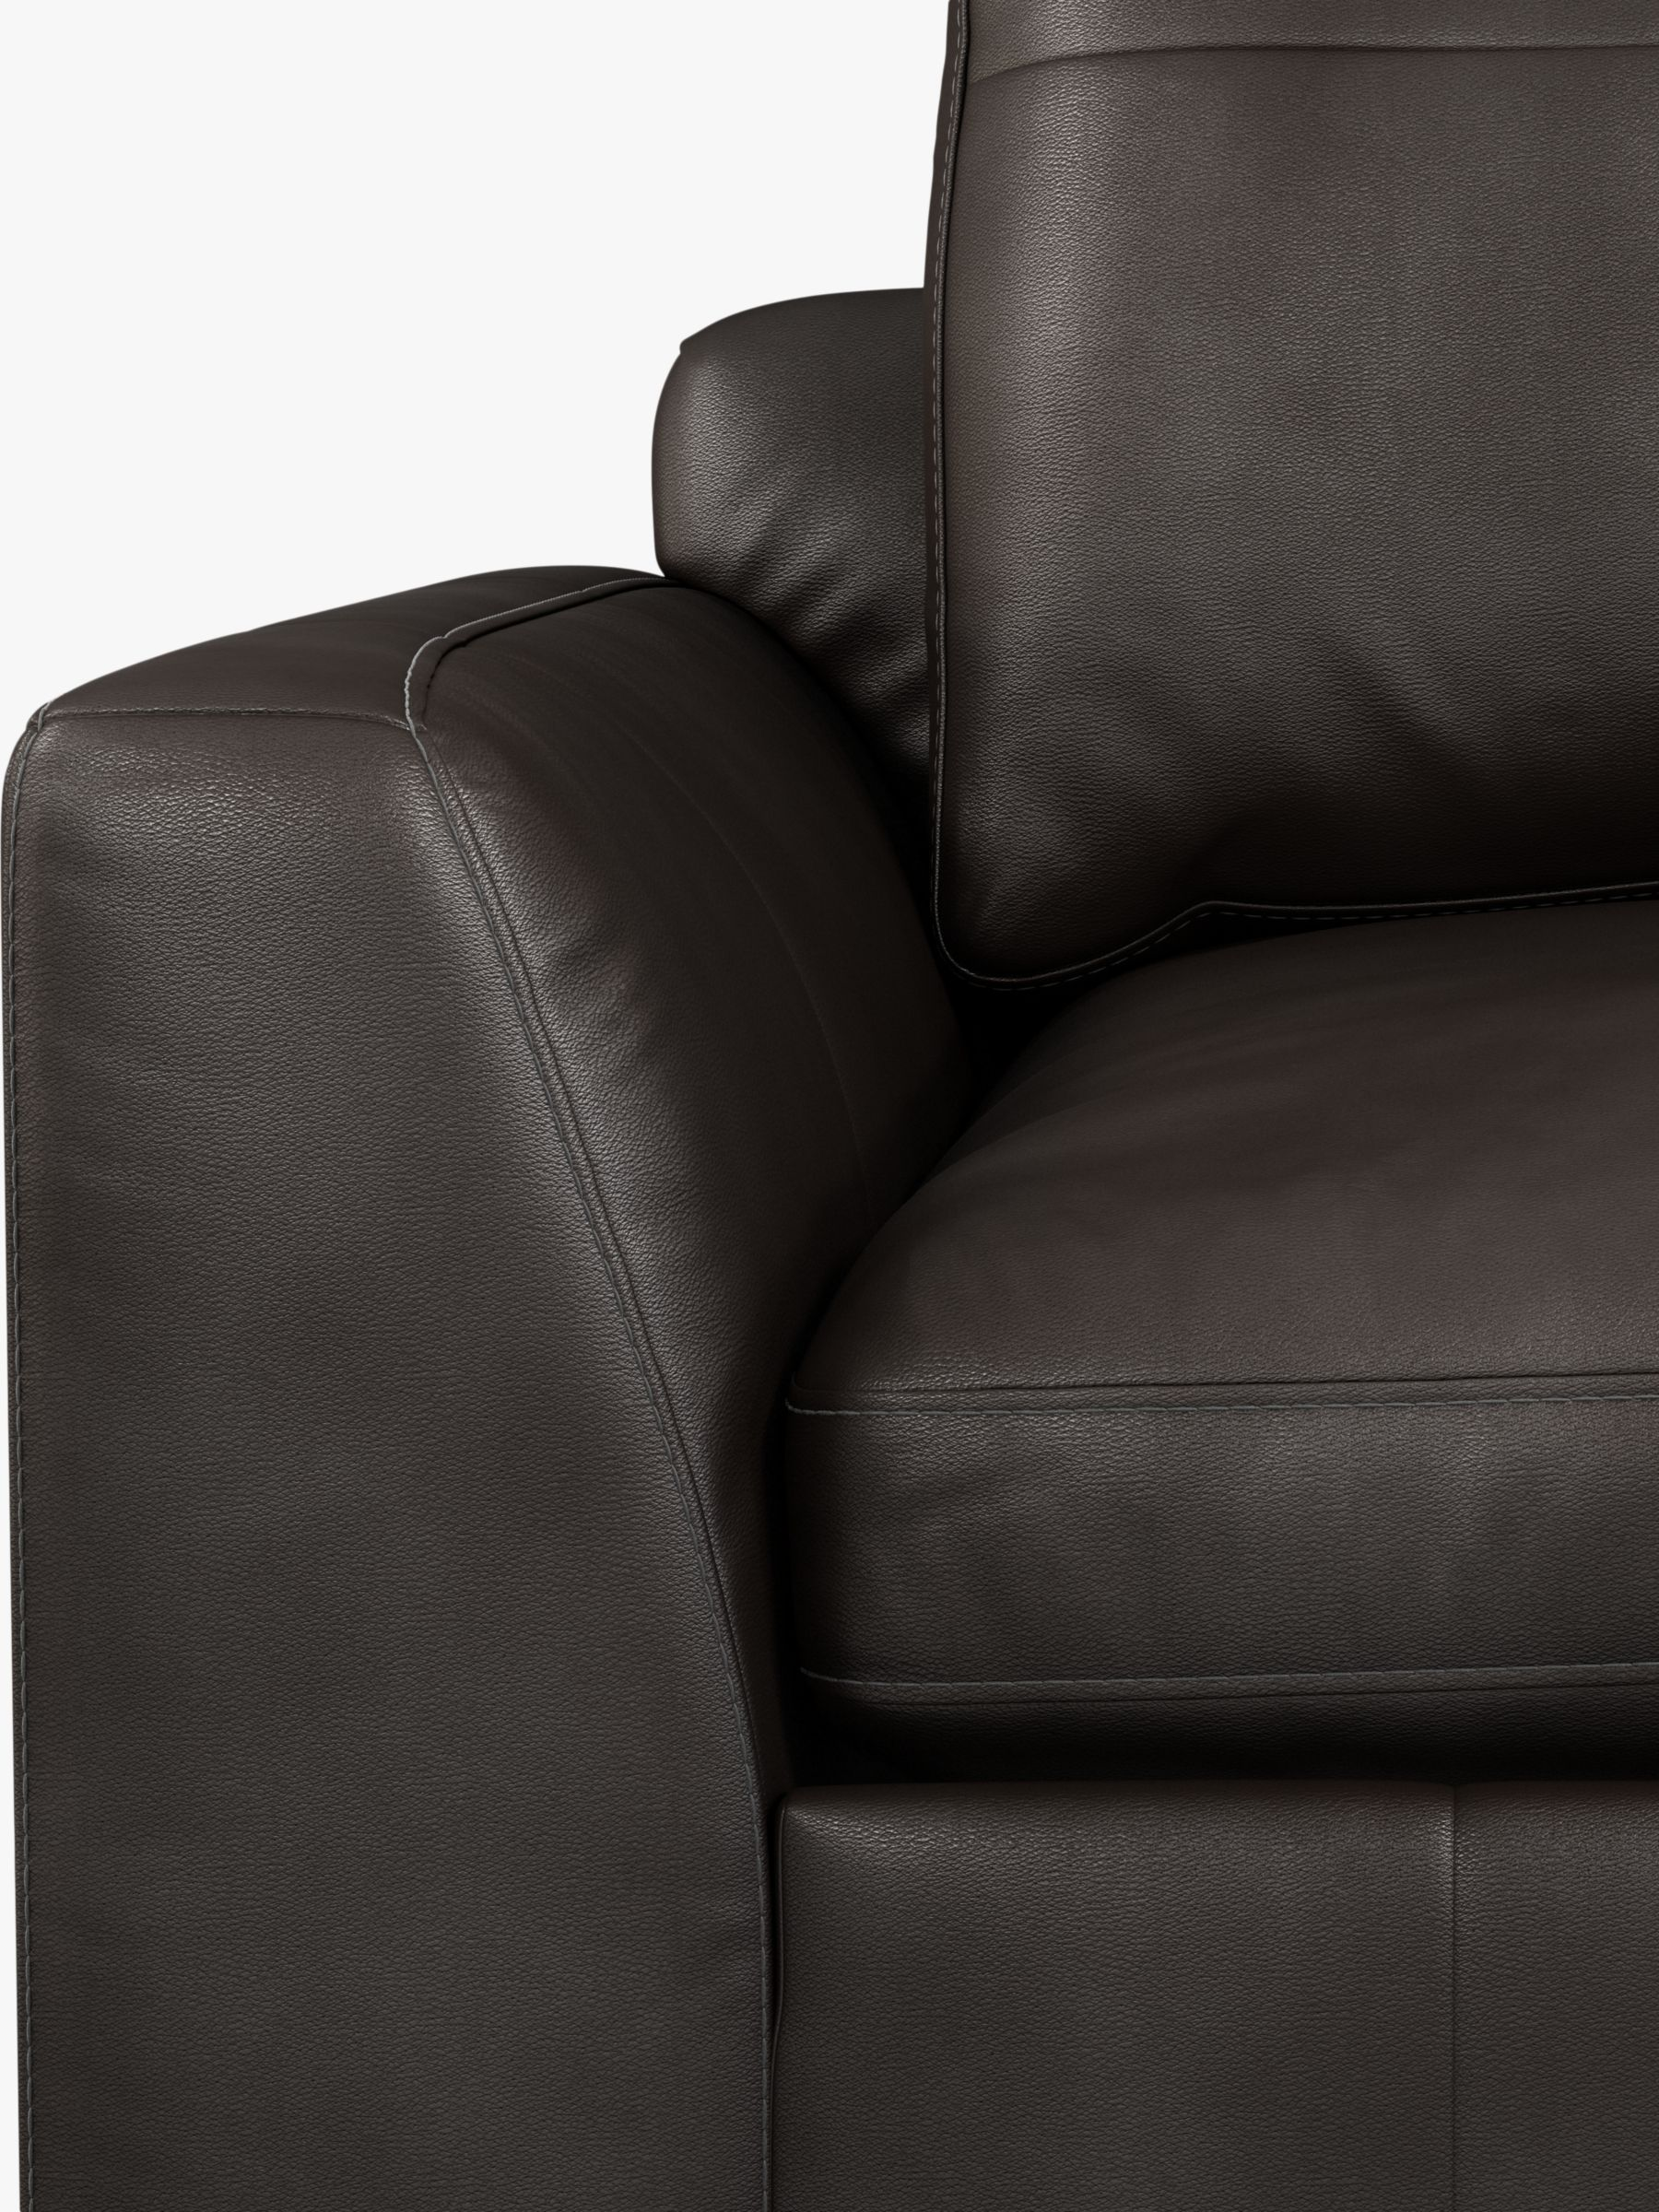 John Lewis Partners Tortona Leather Corner Sofa Dark Leg In 2020 Leather Corner Sofa Leather Sofa Sofa